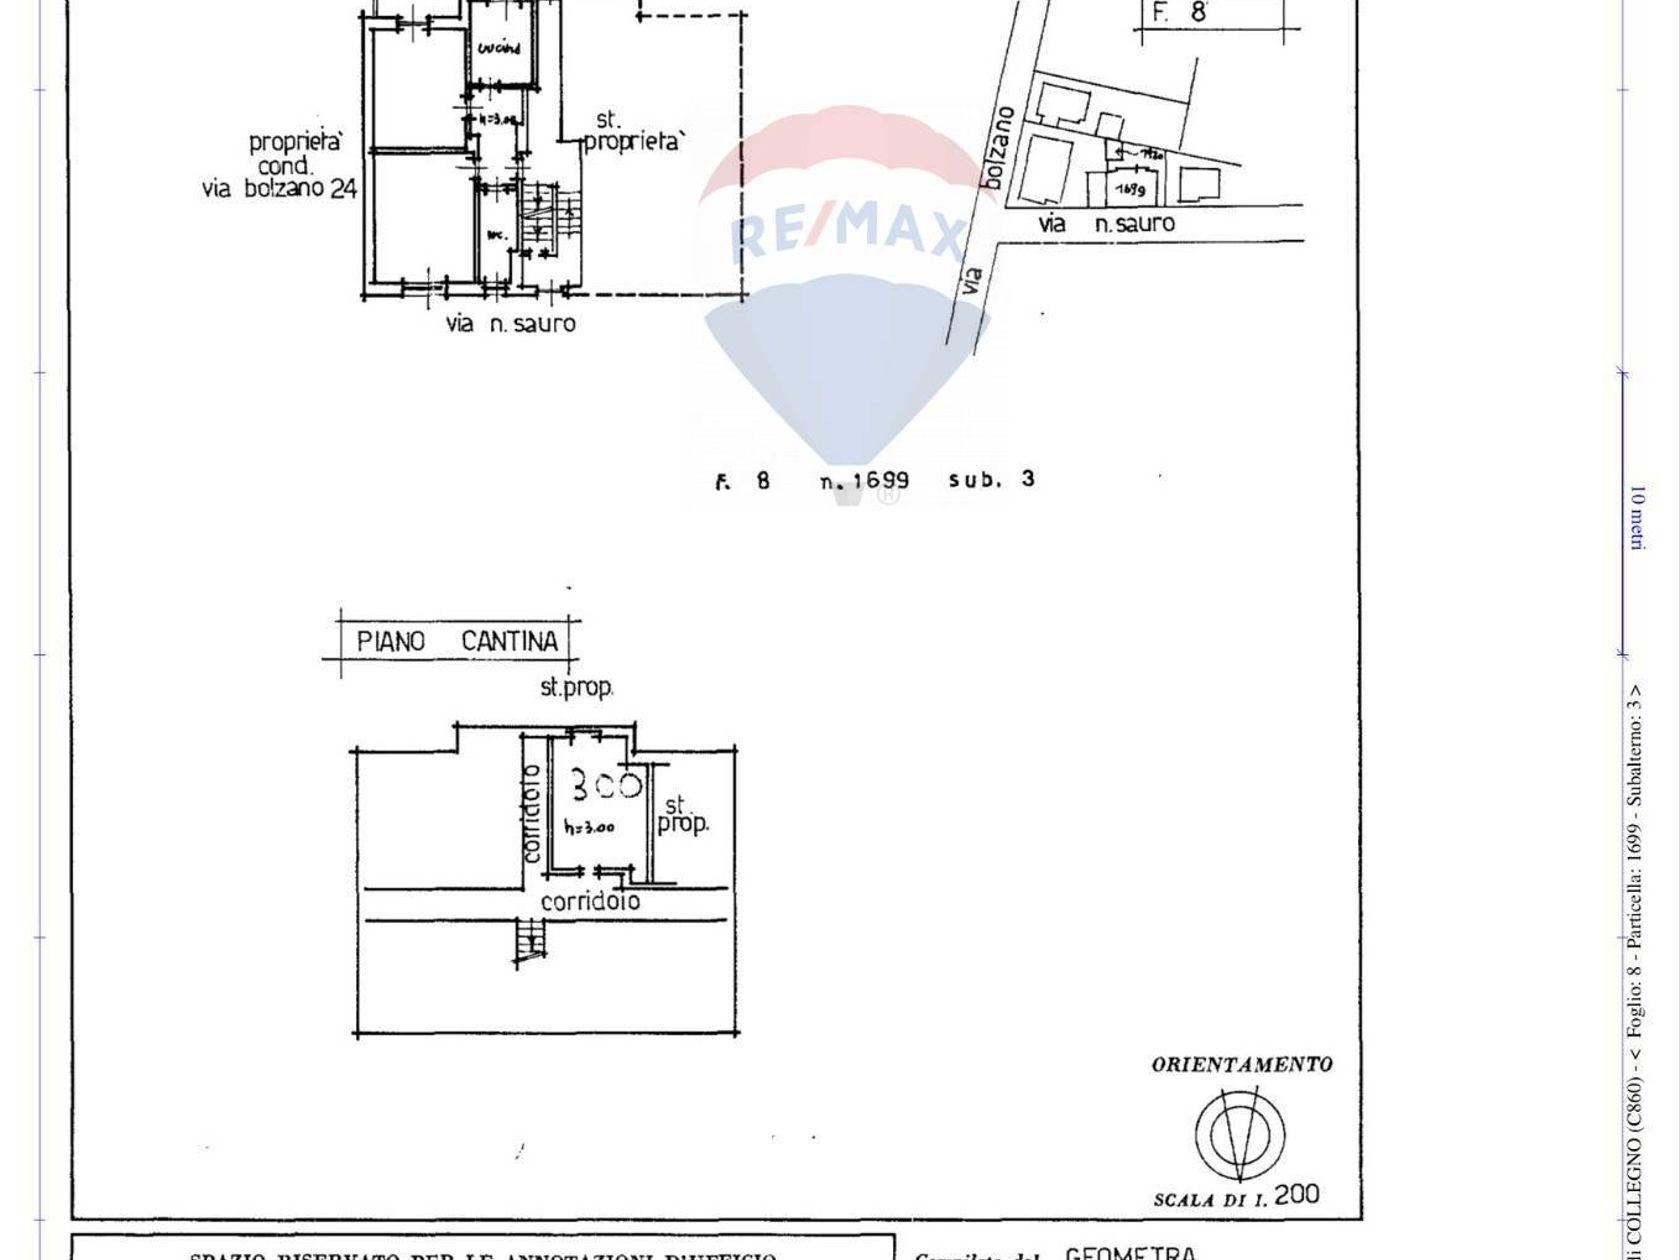 Casa Indipendente Santa Maria, Collegno, TO Vendita - Planimetria 1